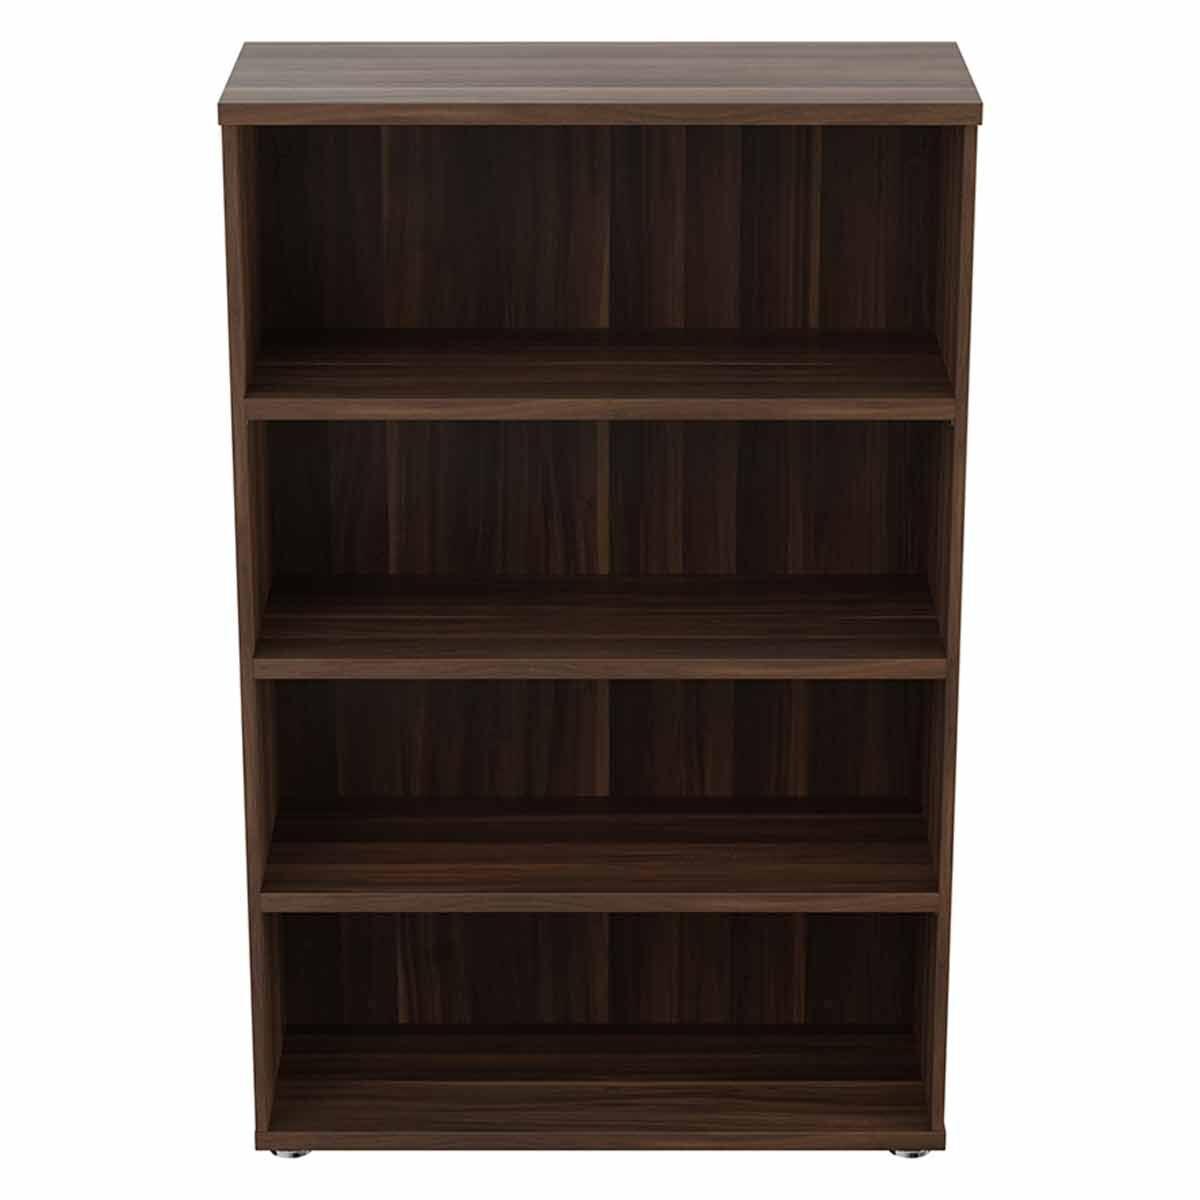 TC Office Regent Bookcase 3 Shelves Height 1600mm Dark Walnut